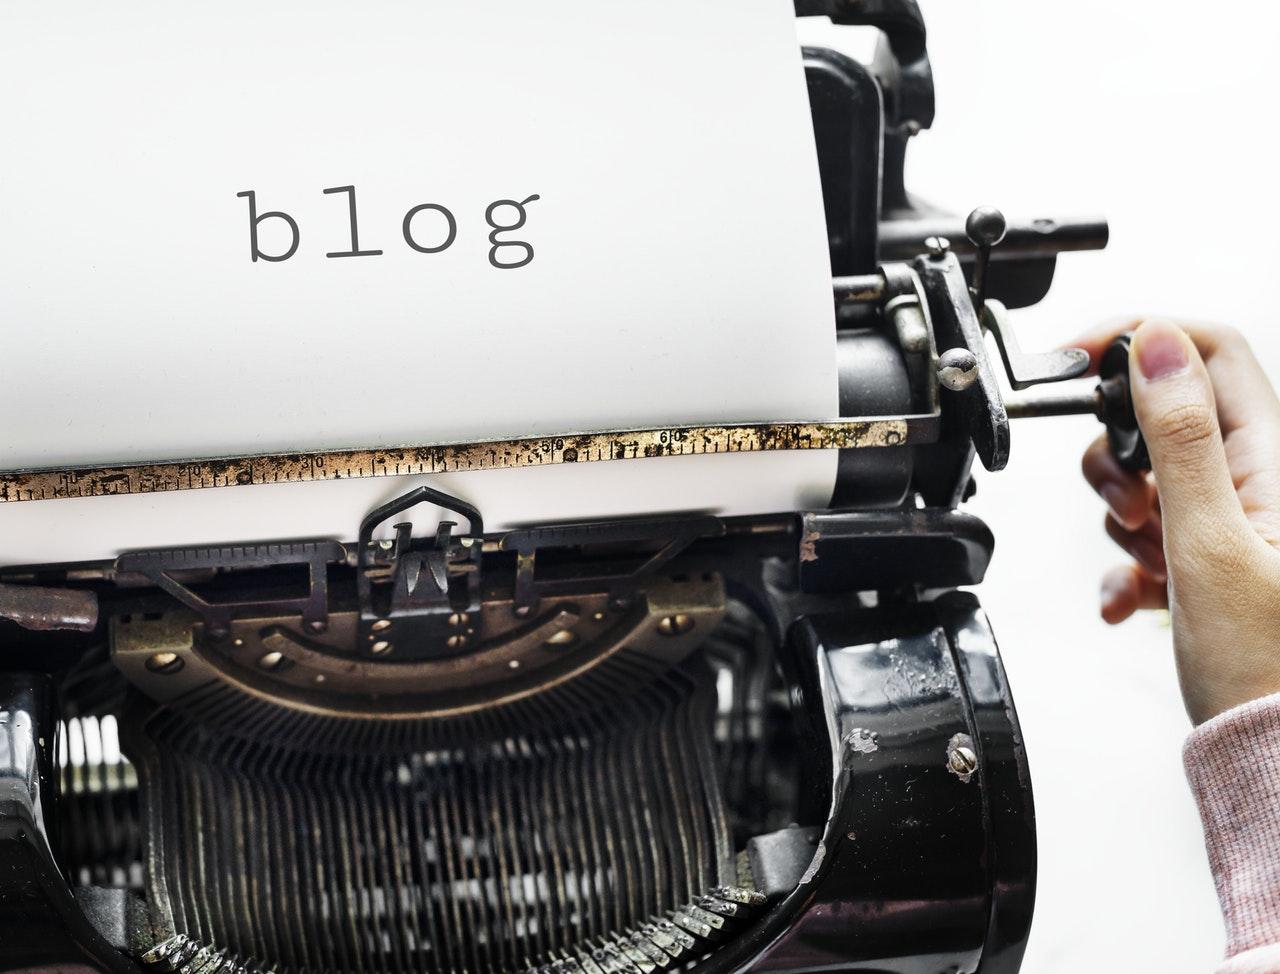 Best Programming Language To start Blogging in 2019